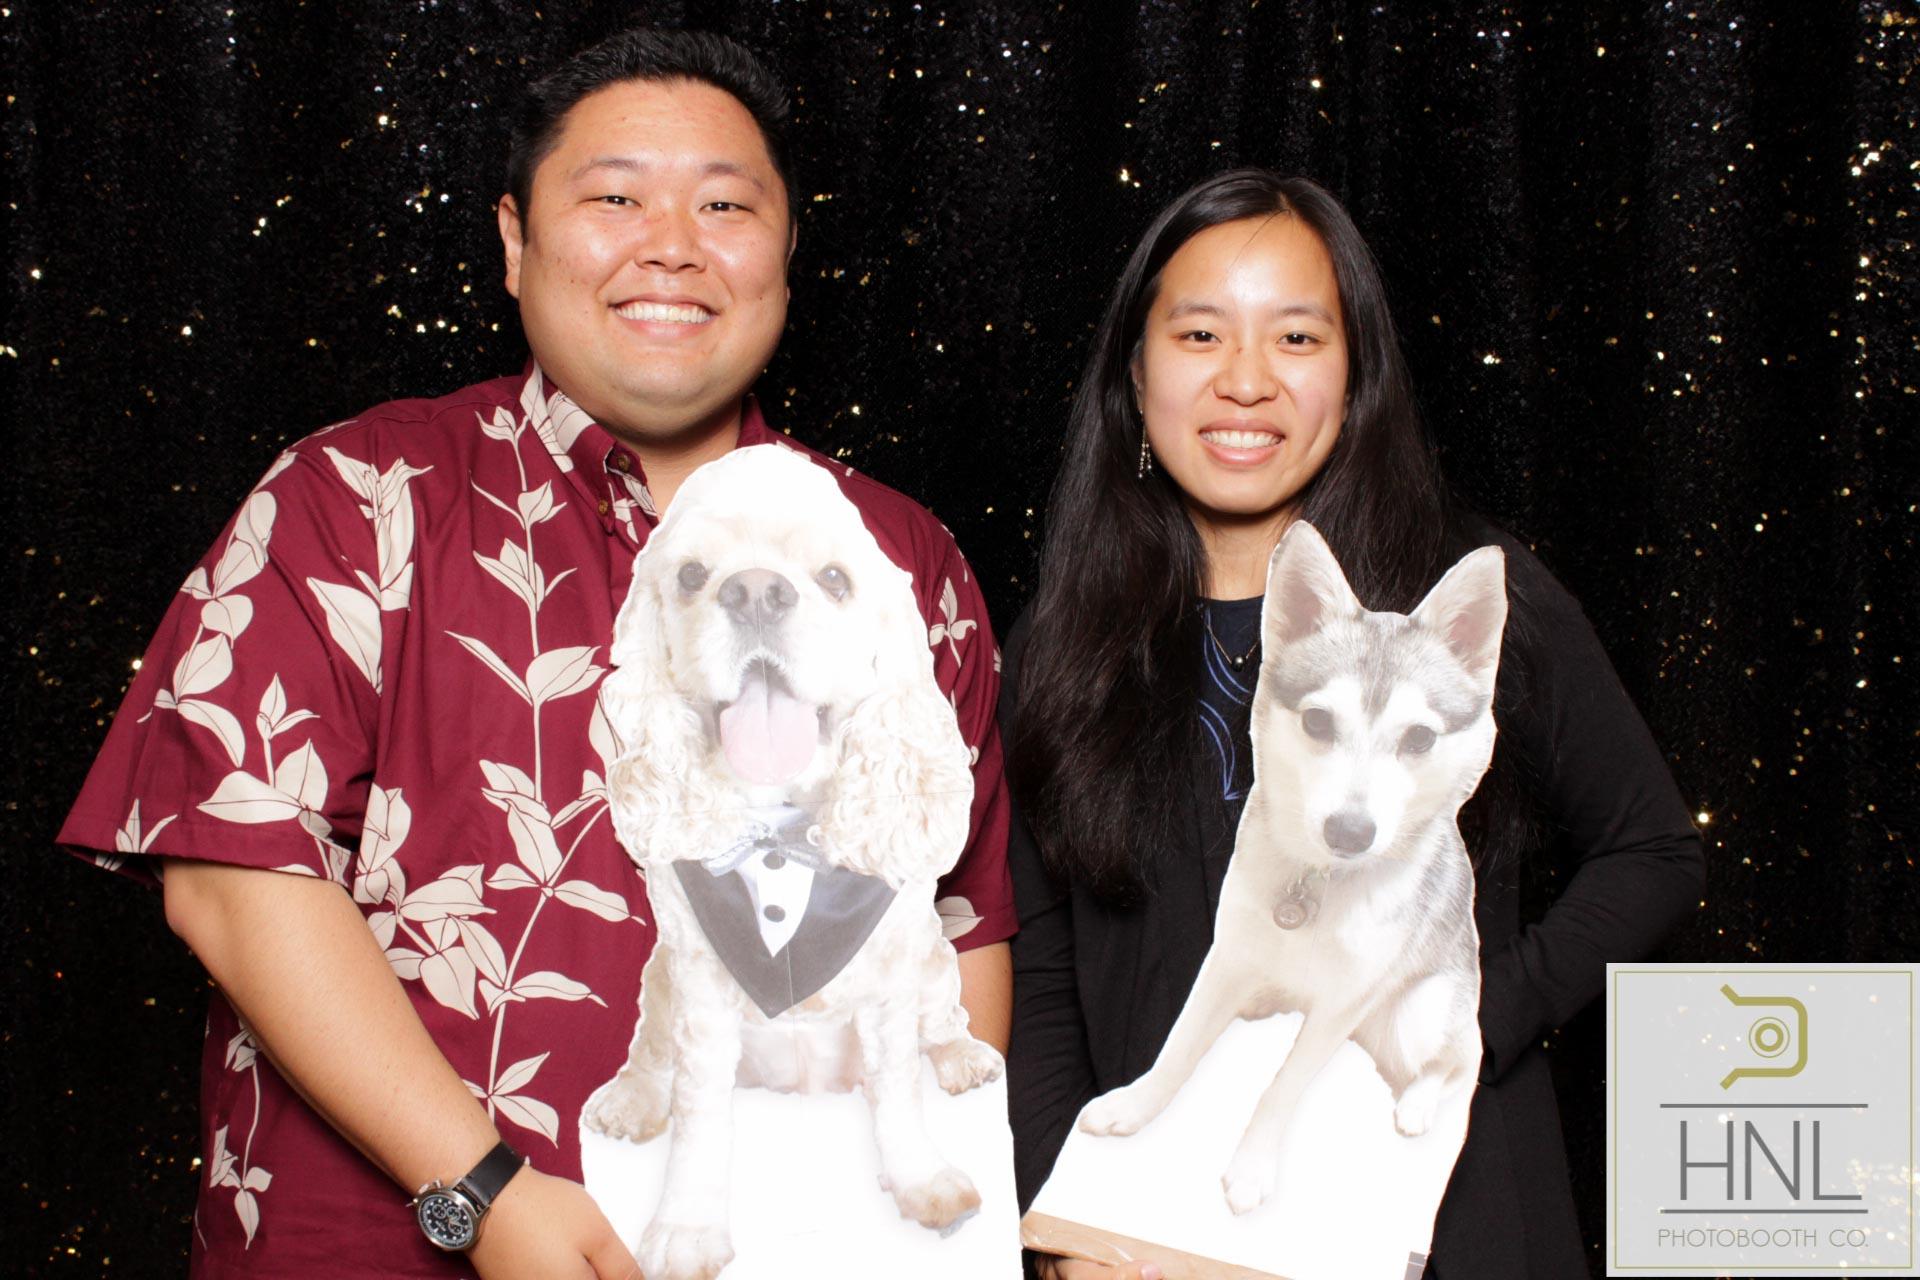 Ryan and Elisha Wedding Hale Koa Hotel Oahu Honolulu Hawaii (33 of 171).jpg